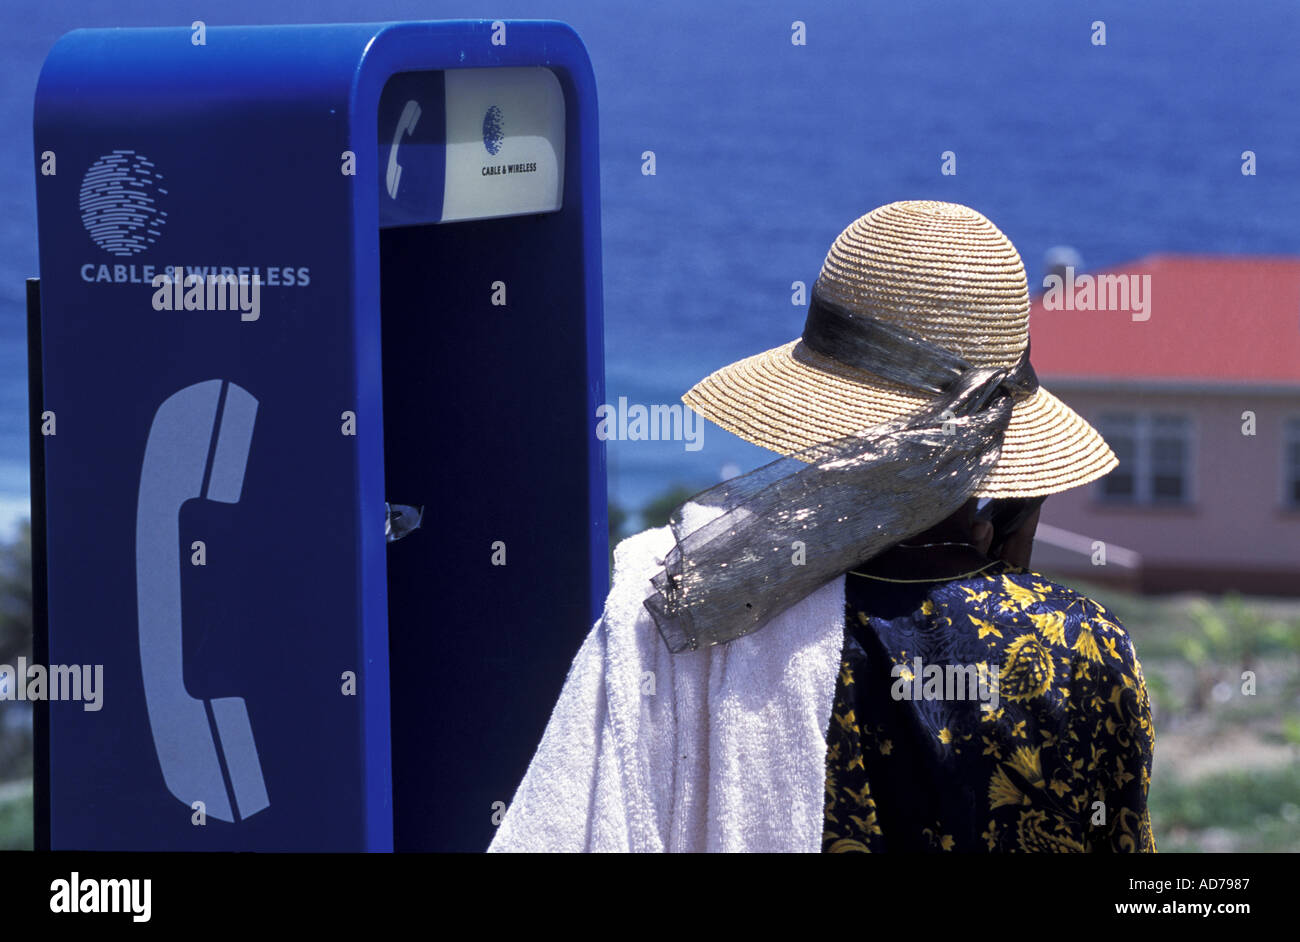 CARIBBEAN BRITISH WEST INDIES BARBADOS LA BARBADE THE BAJAN PEOPLE WOMAN AT PHONE BOOTH